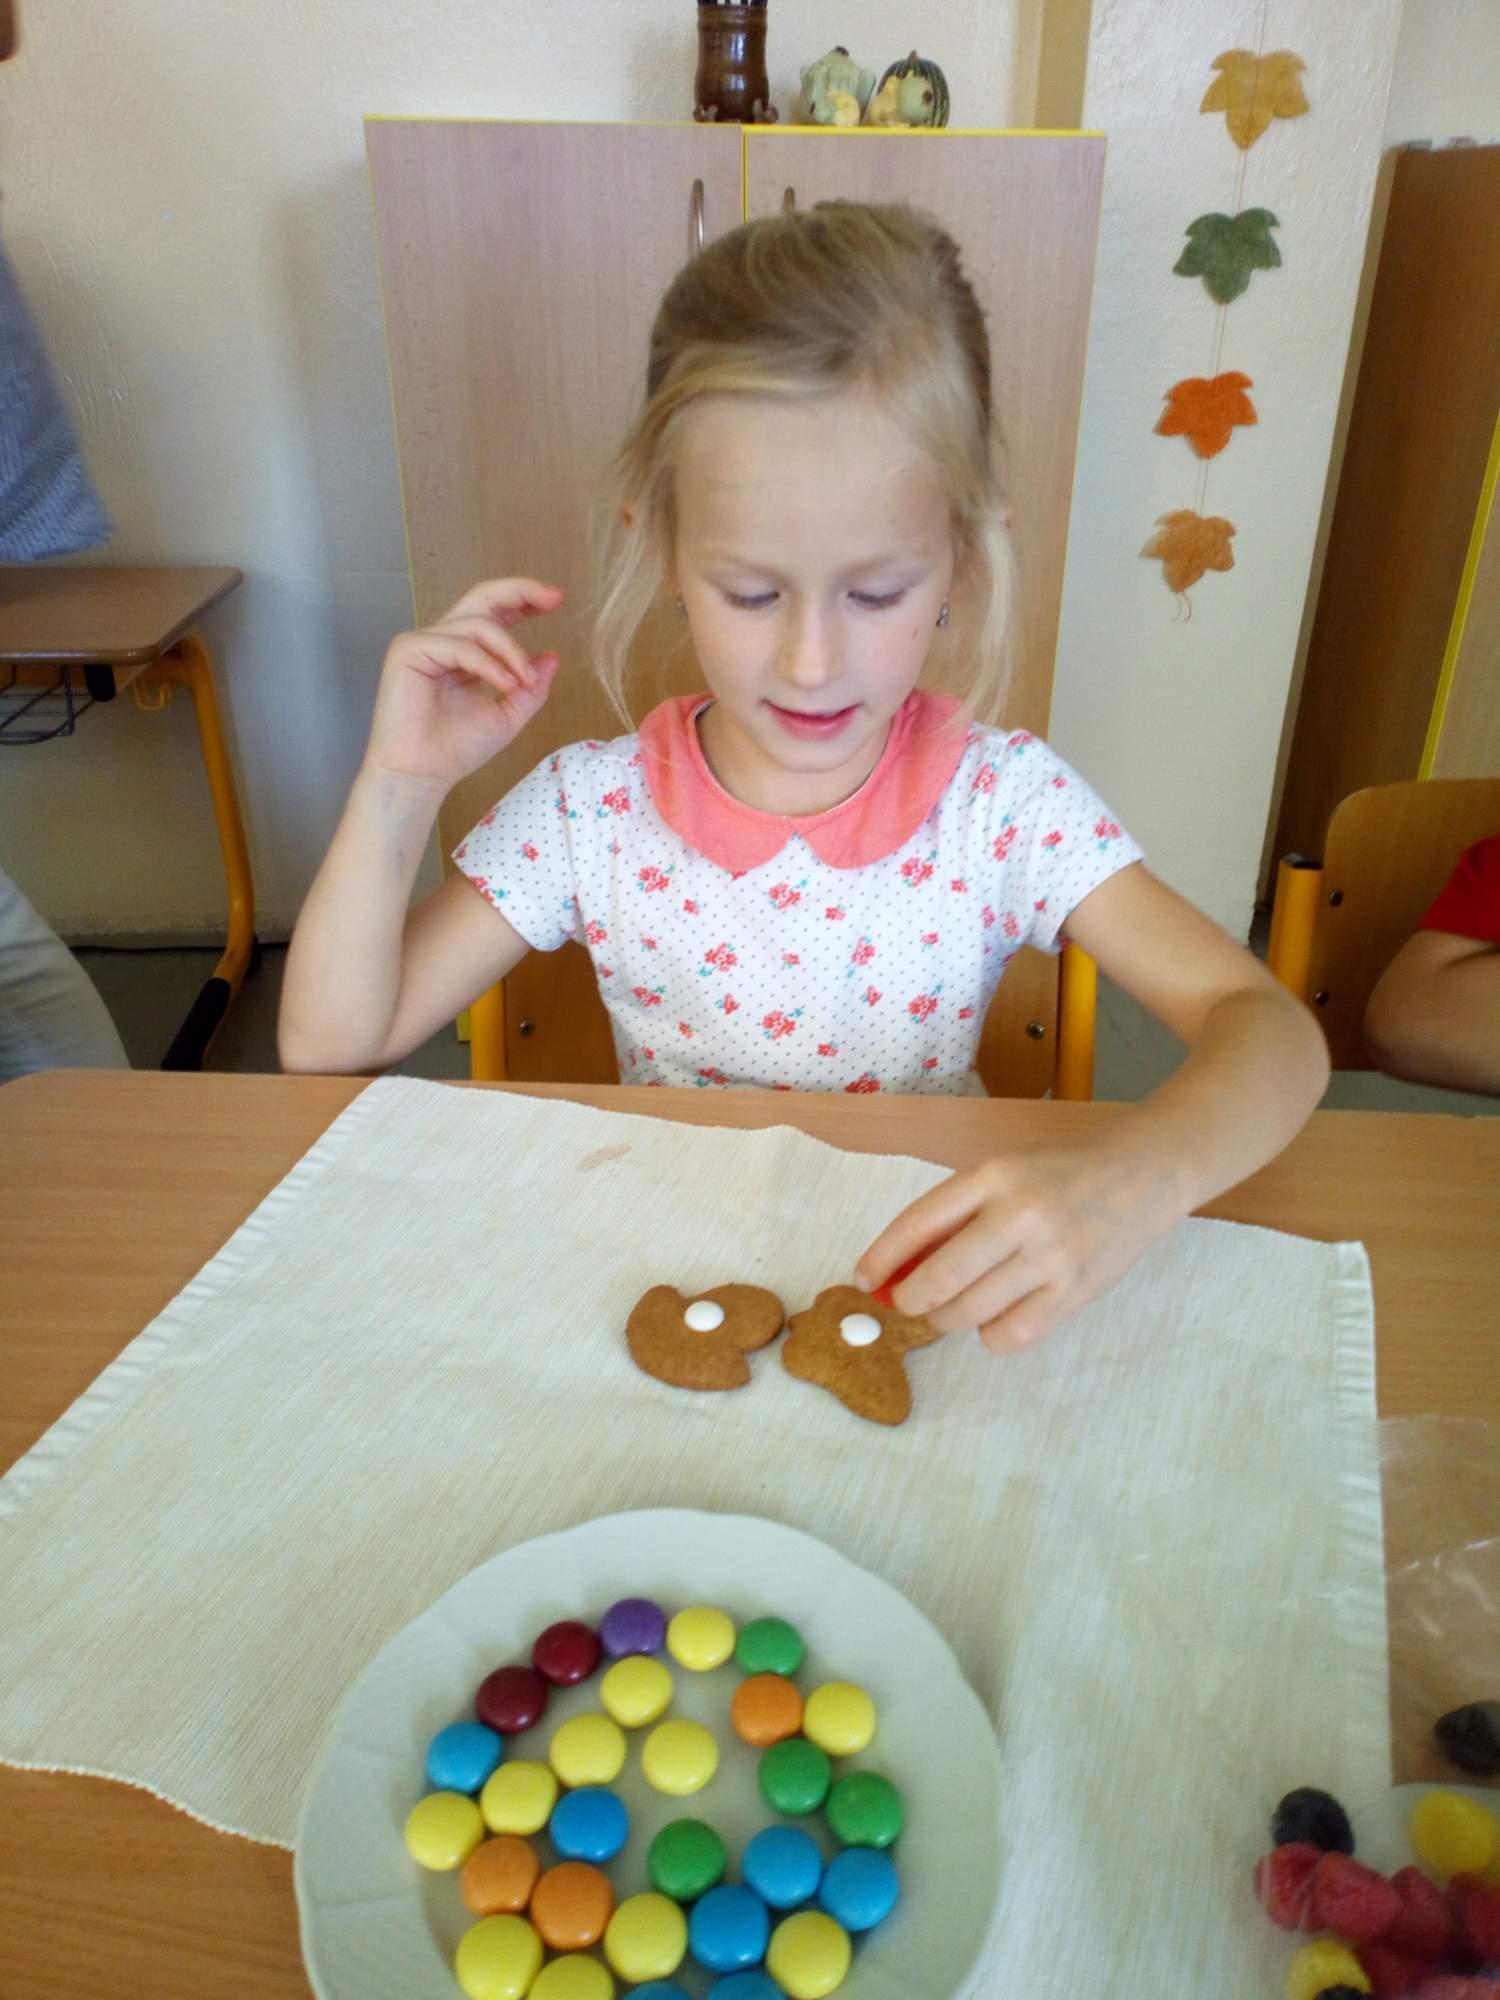 rajce.idnes.cz girl child panty